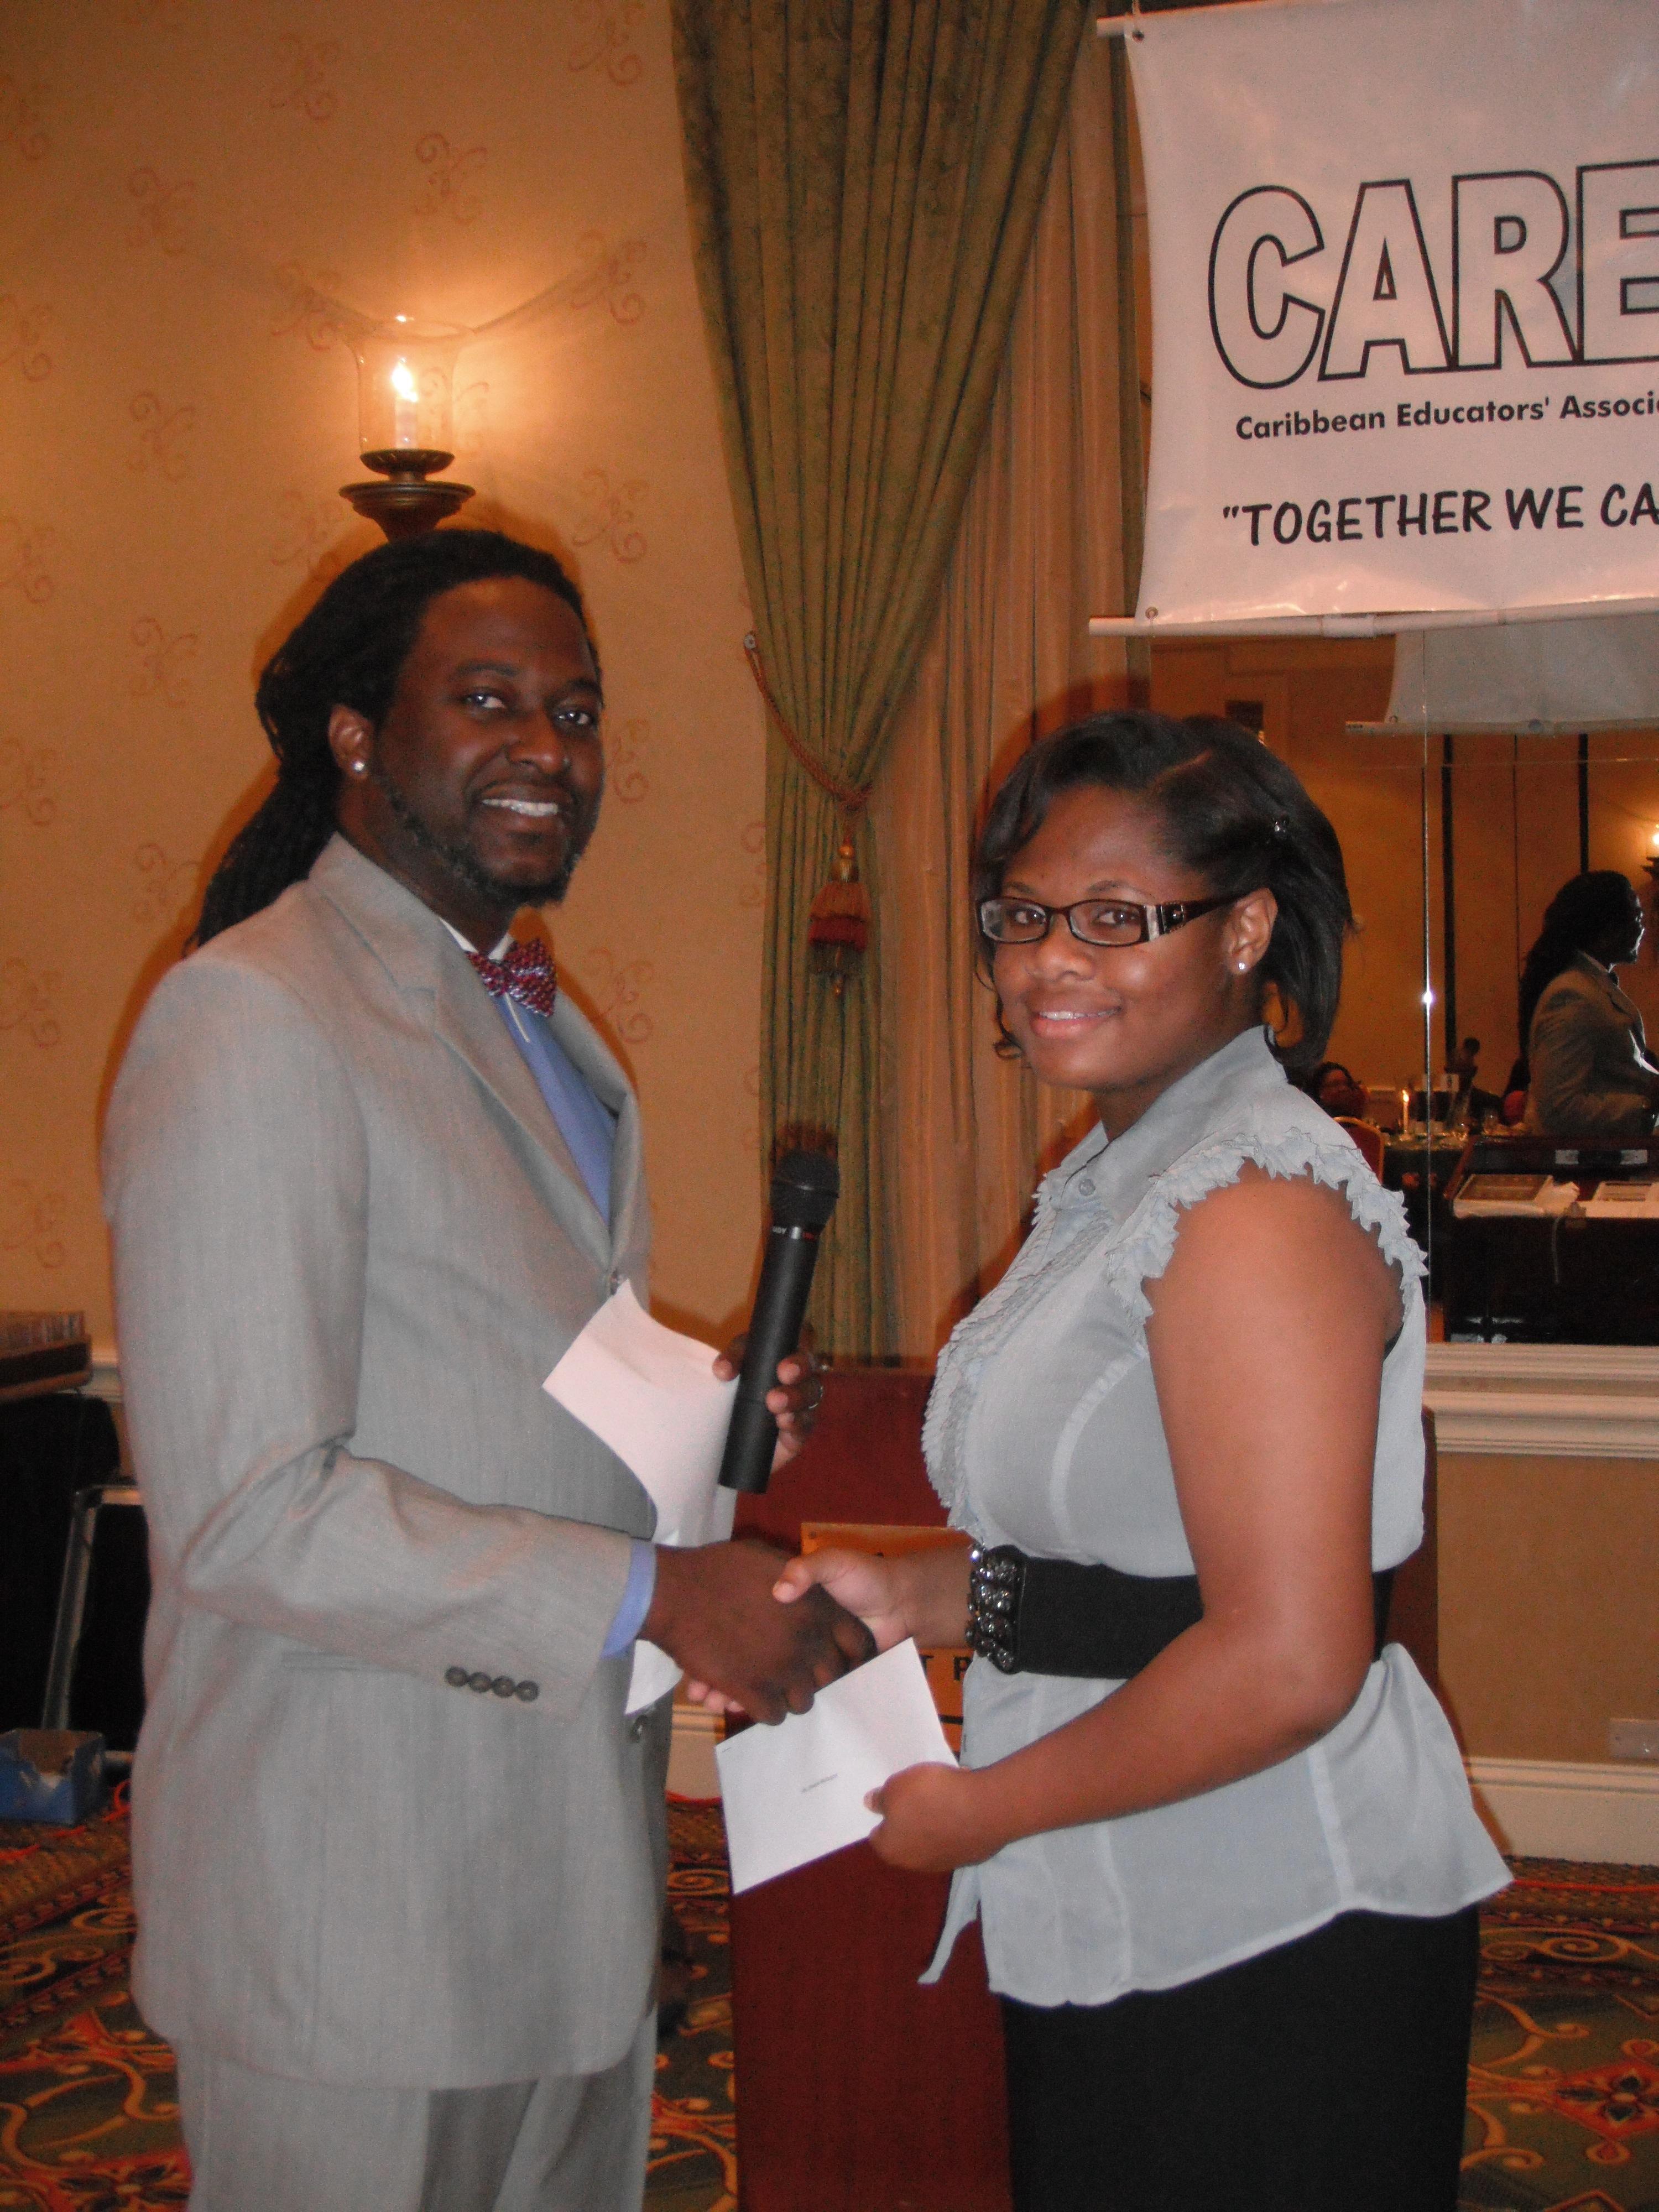 8 Scholarship Recipient with Presenter at Caribbean Educators Association Annual Scholarship Awards 2012